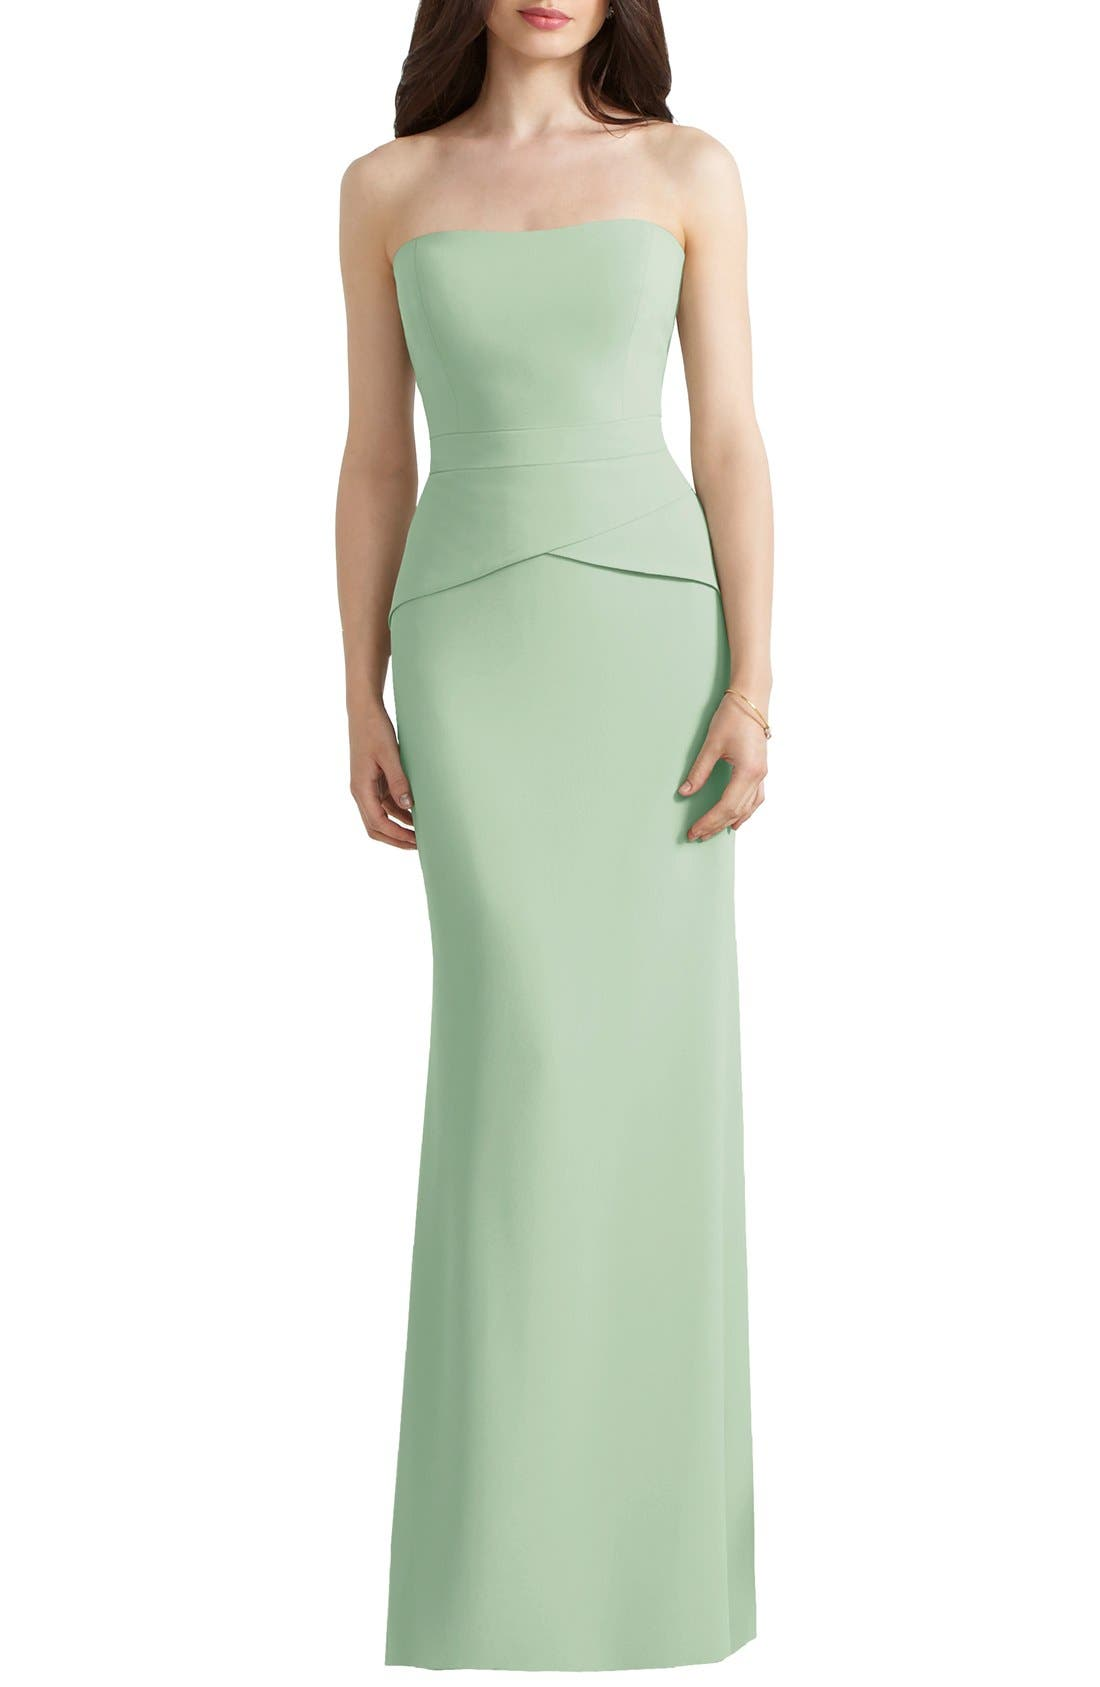 Main Image - Social Bridesmaids Strapless Peplum Detail Georgette Gown